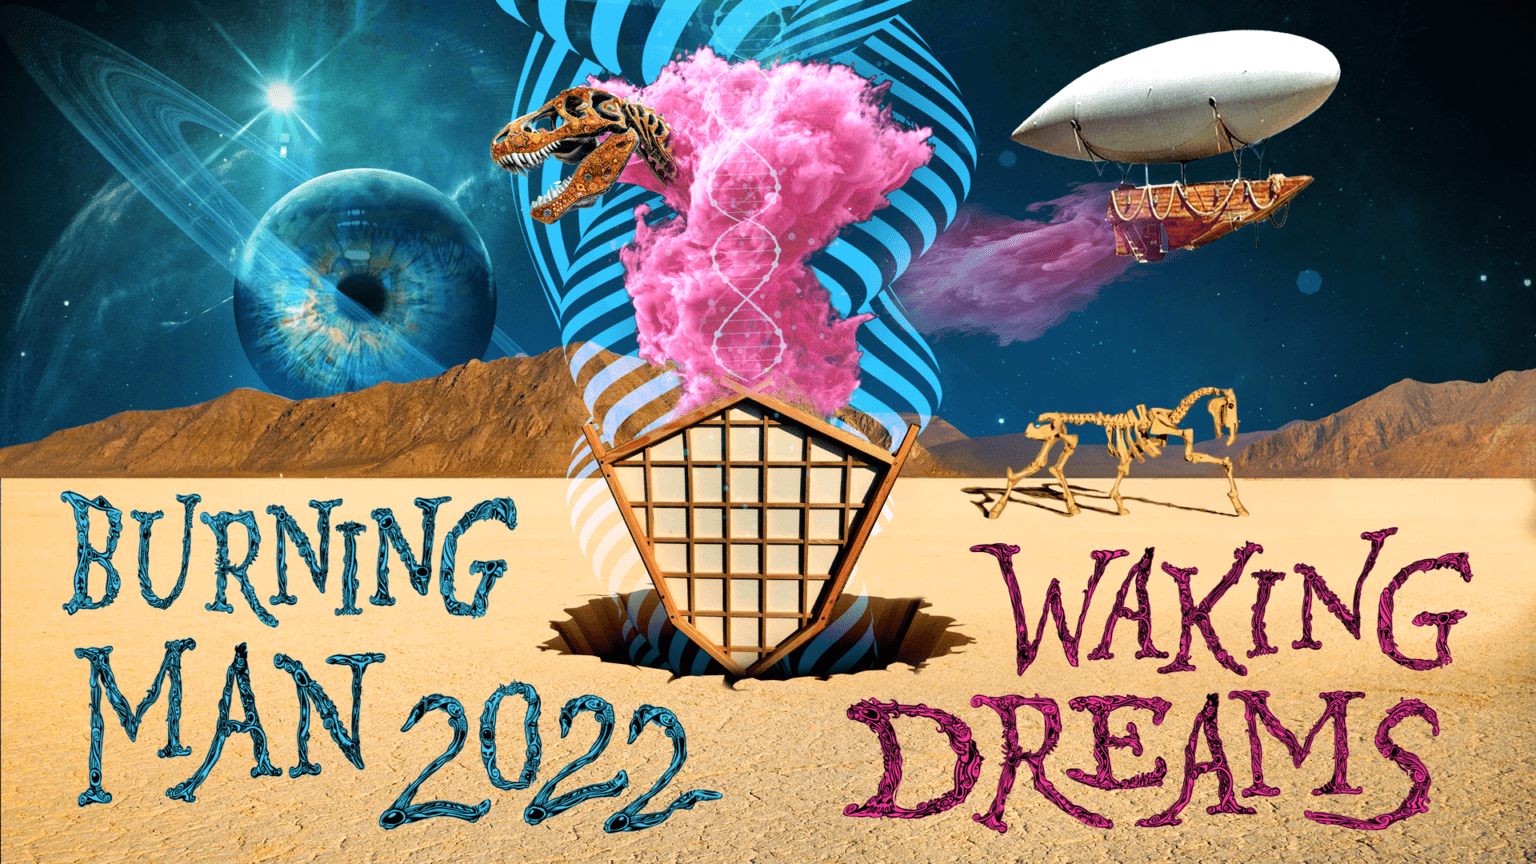 Burning Man Returns With 2022 Theme: Waking Dreams